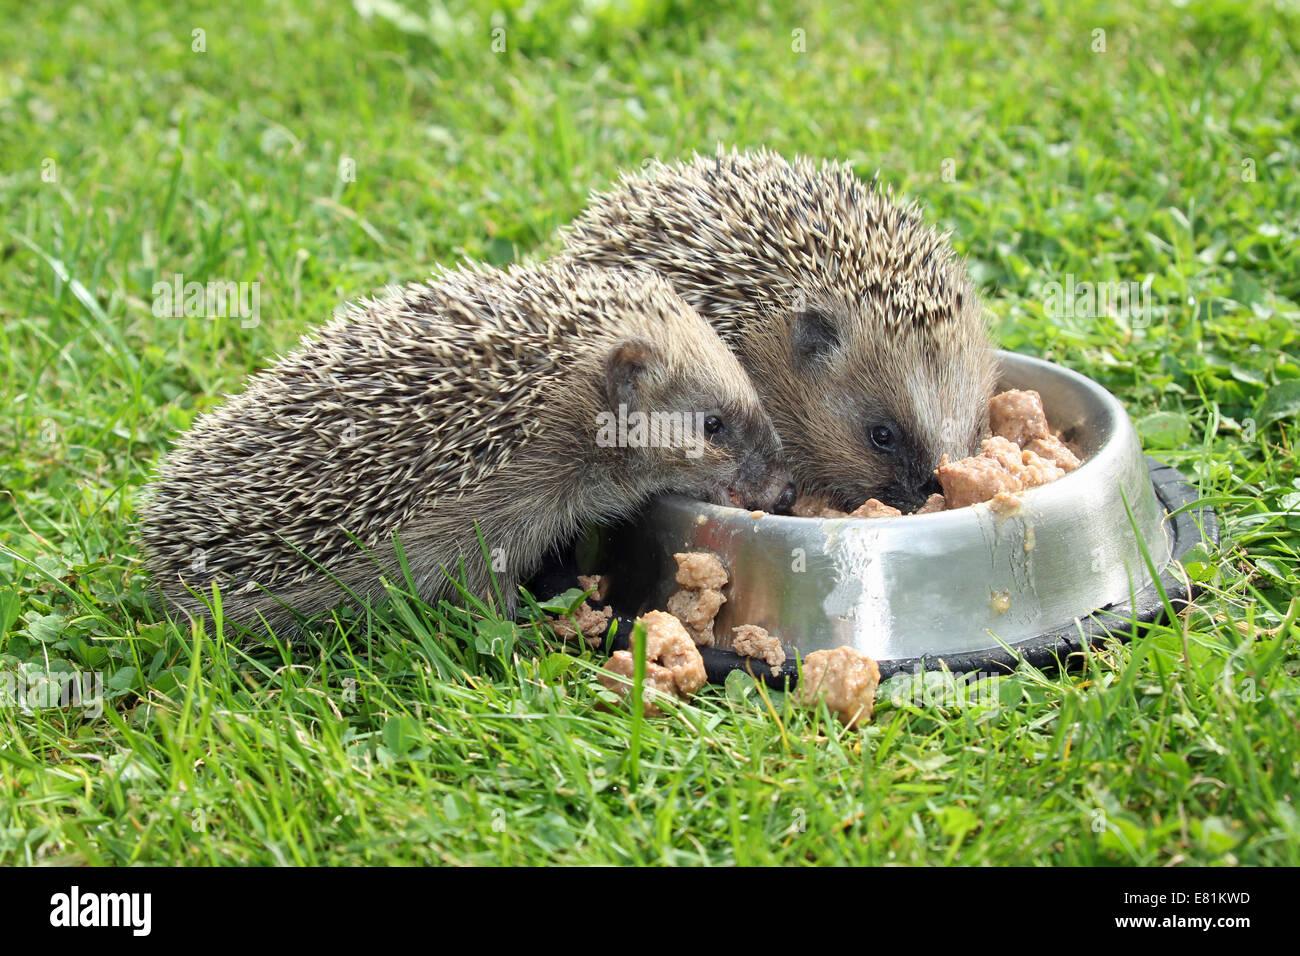 Hedgehog (Erinaceus europaeus), young animals, 4 weeks, feeding from feeding bowl in the garden, Allgäu, Bavaria, - Stock Image